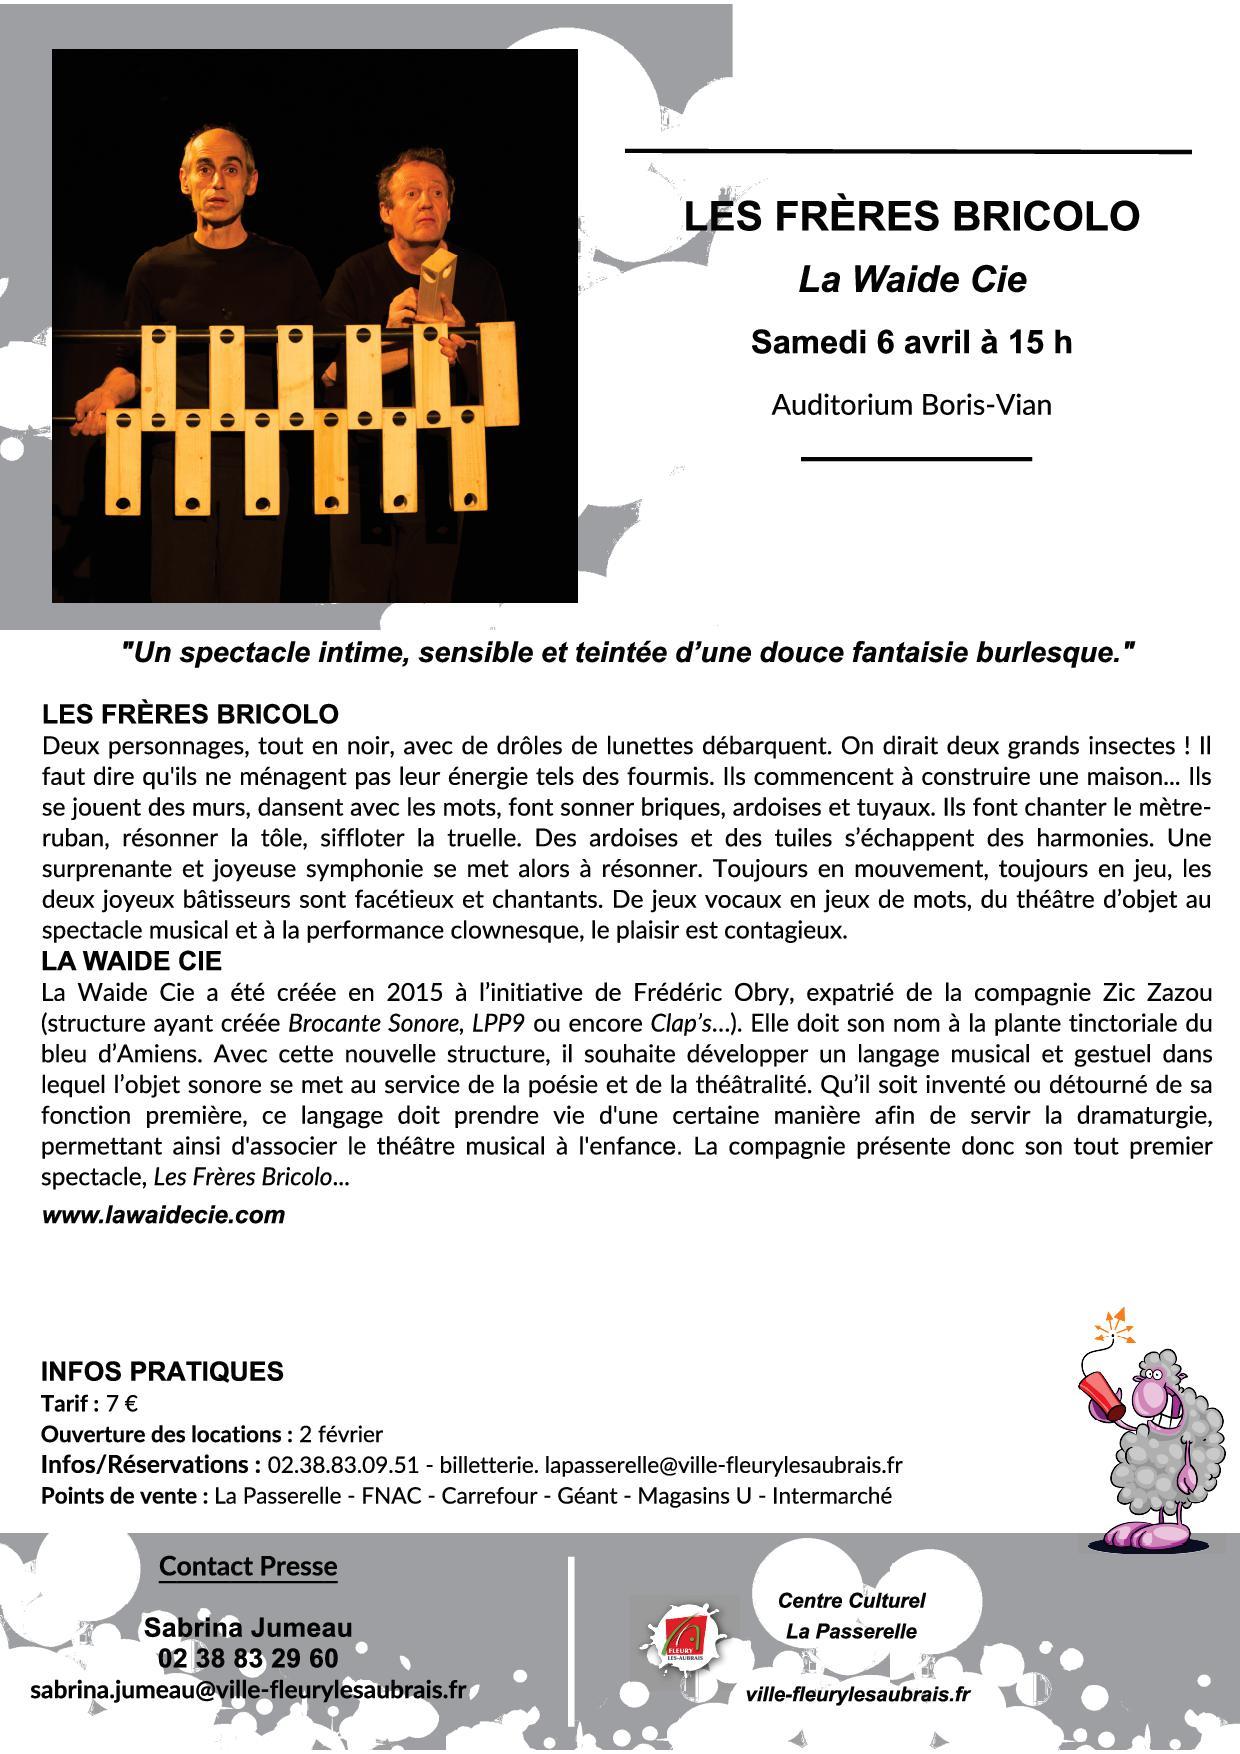 Les Frères Bricolo - 6 avril.jpg